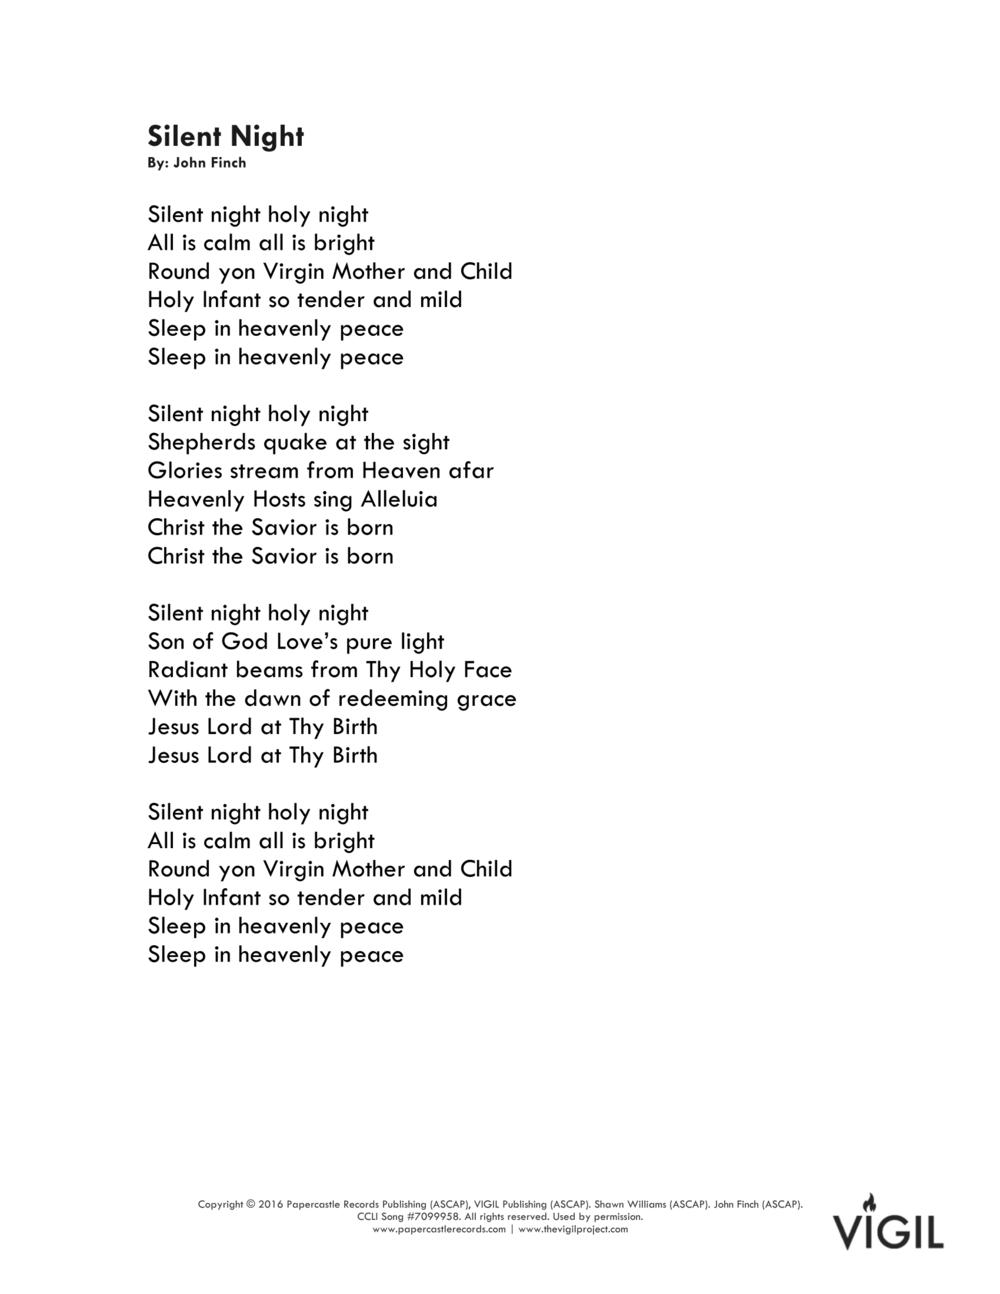 VIGIL S2 - Silent Night (Lyrics)-1.png